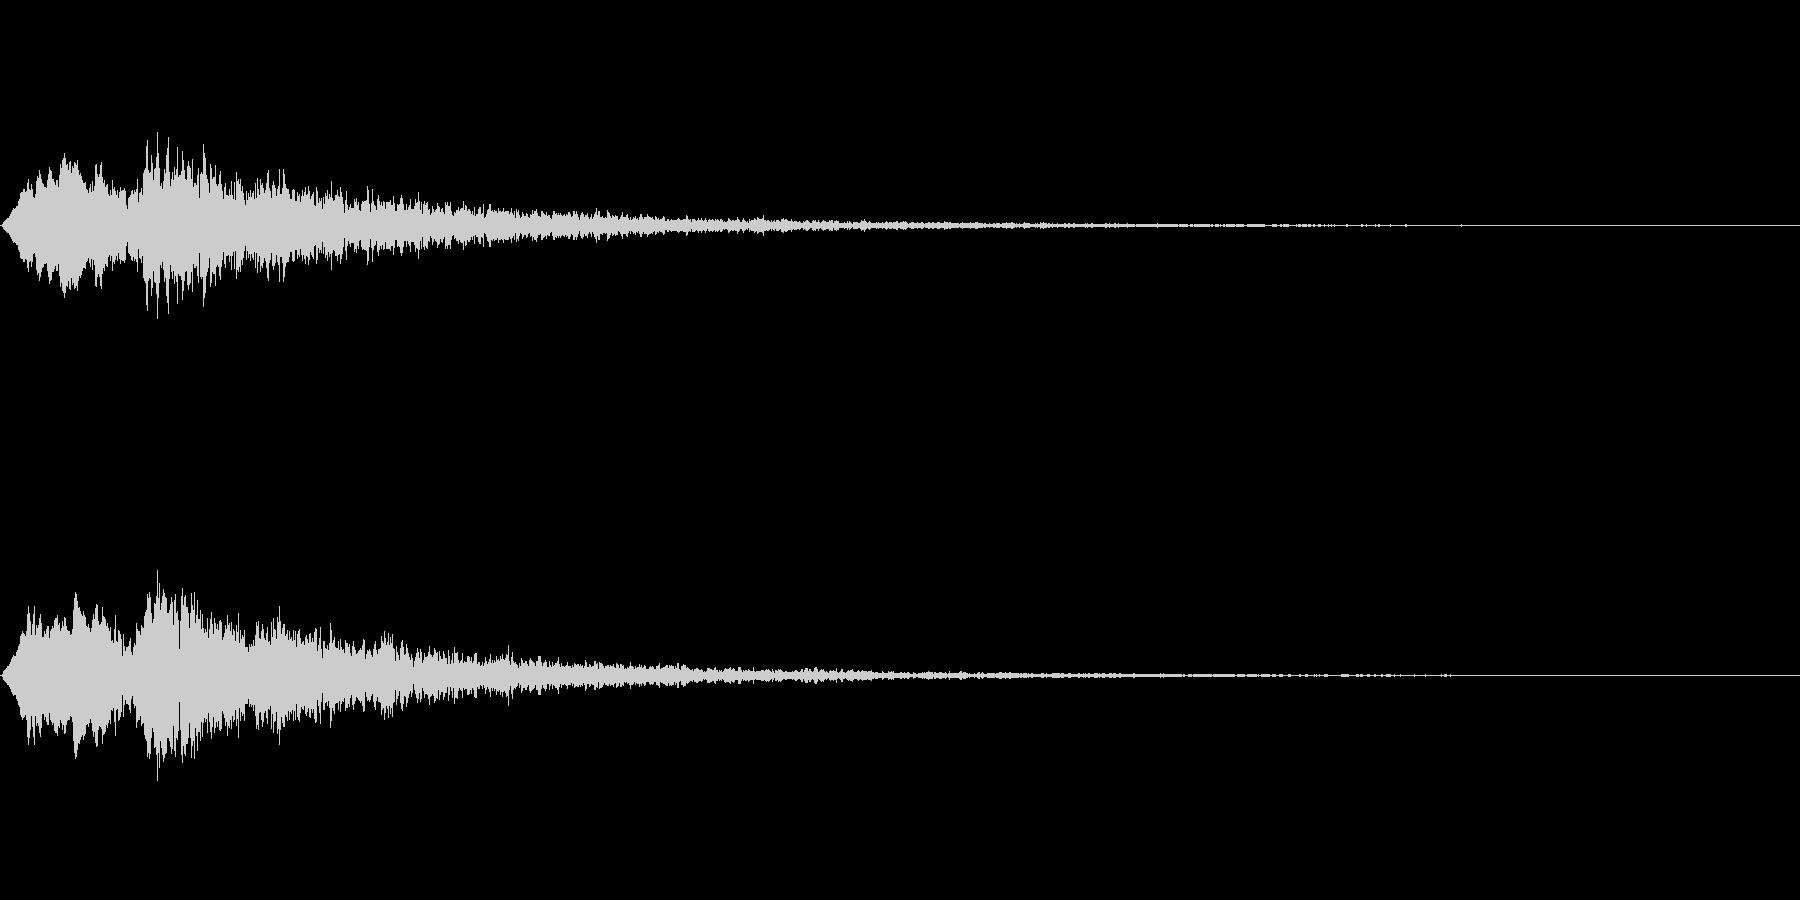 Vox 不気味な鳴き声 ホラーSE 8の未再生の波形